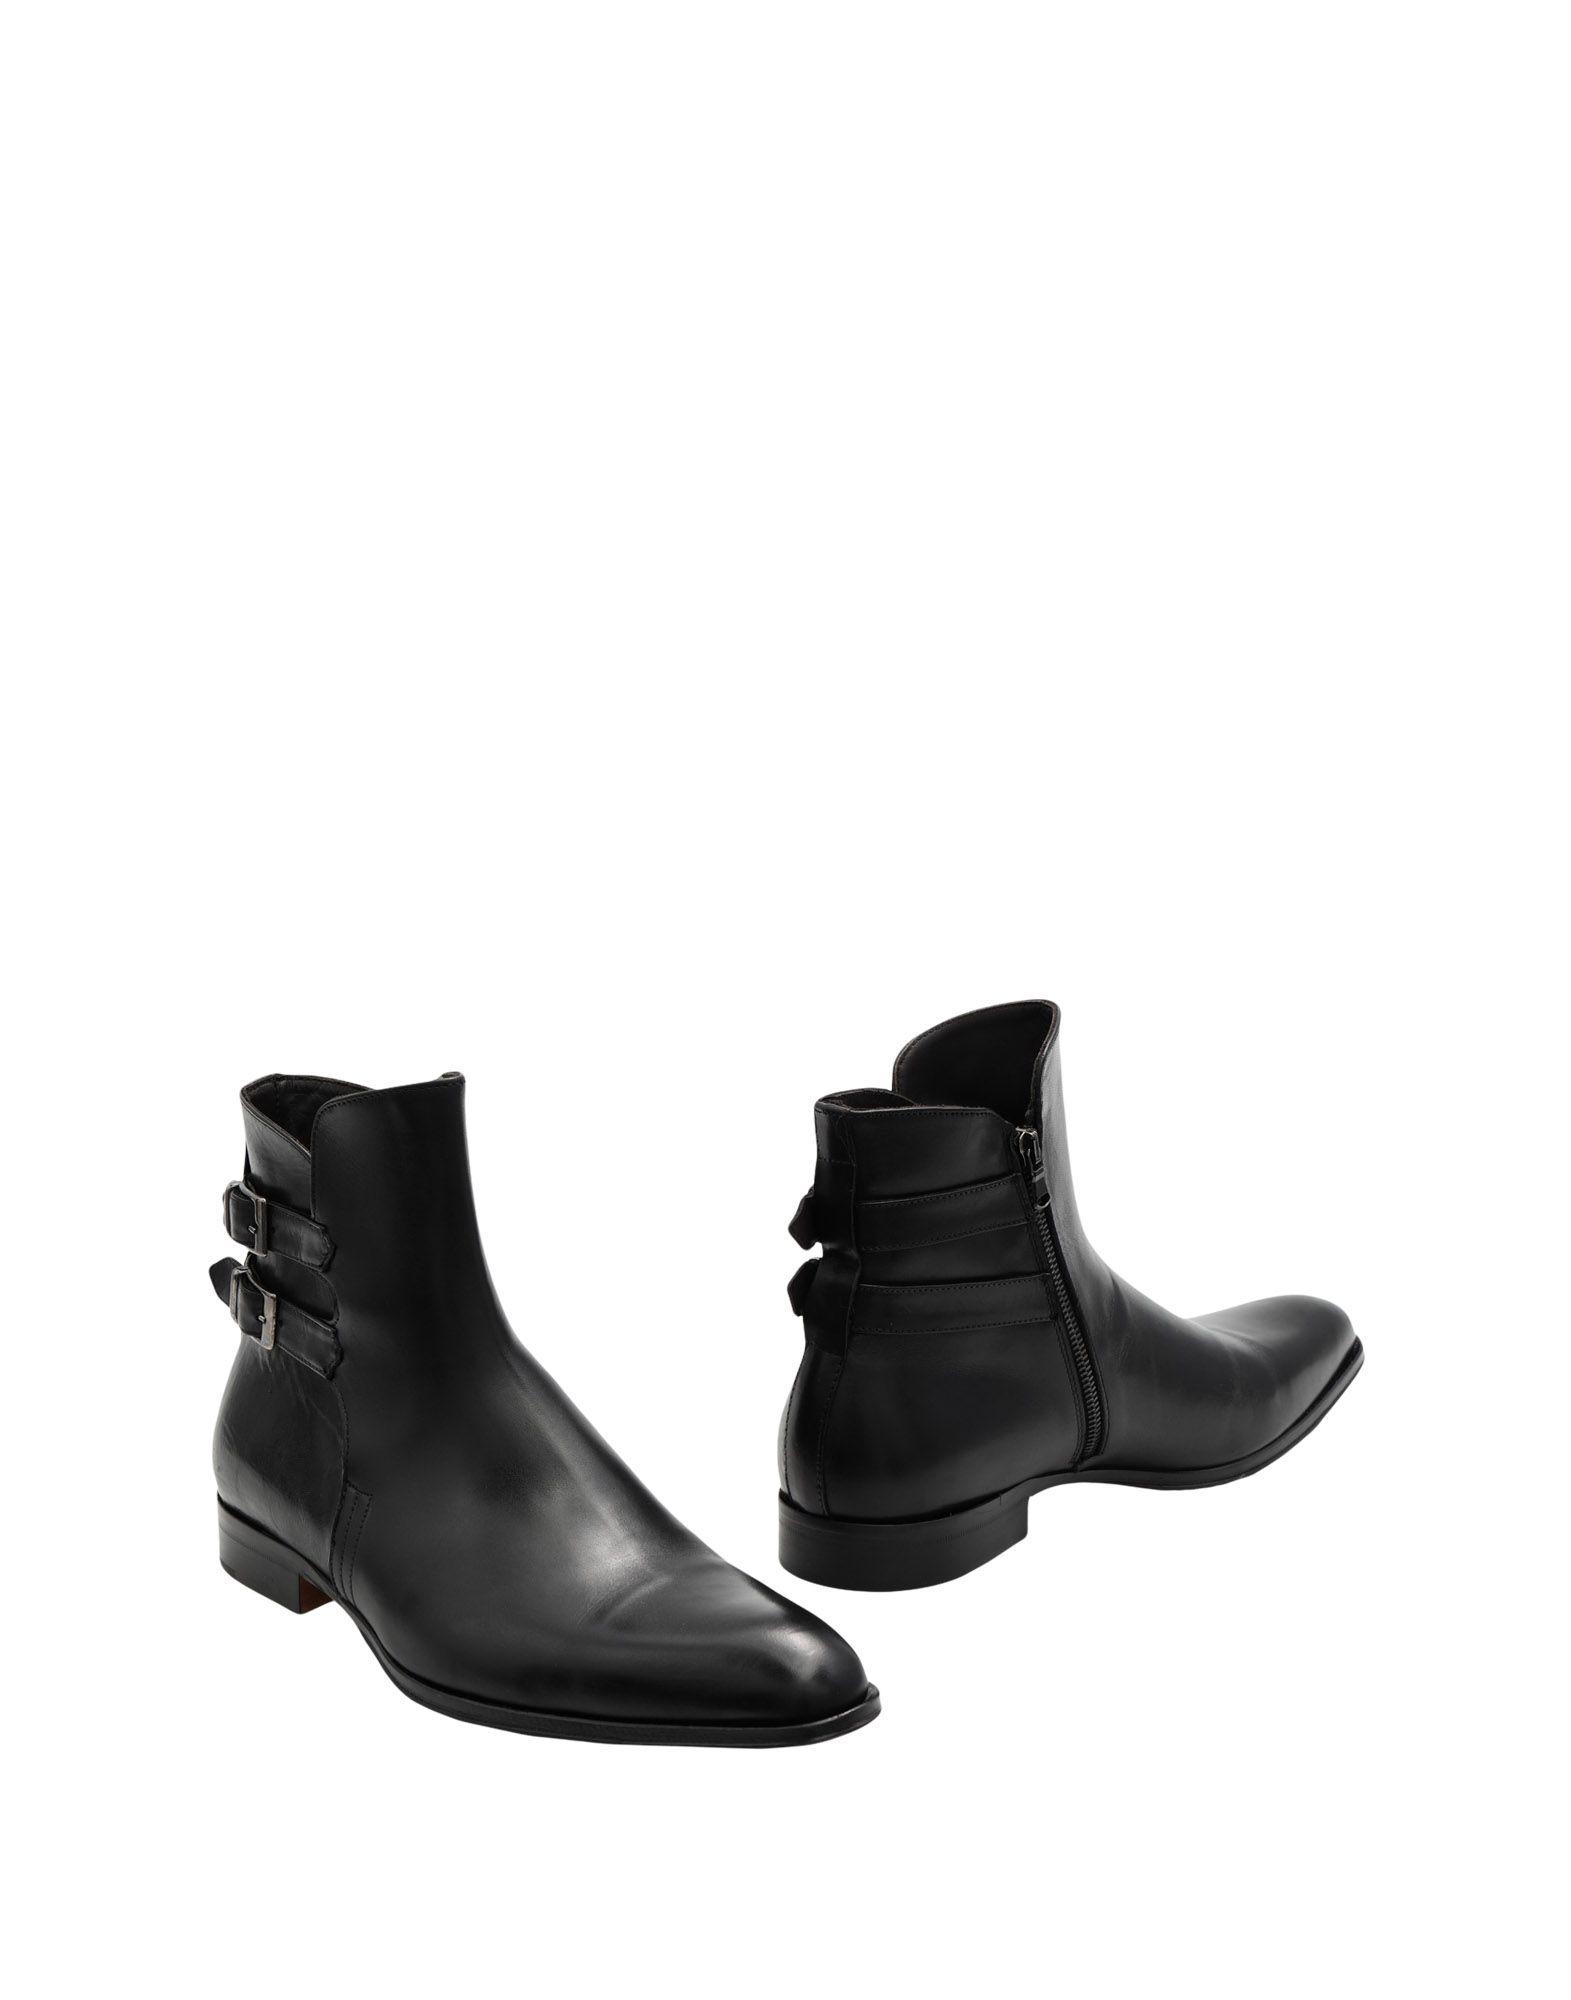 Leonardo Principi Boots - Men Men Men Leonardo Principi Boots online on  Australia - 11524766OD 58f98d